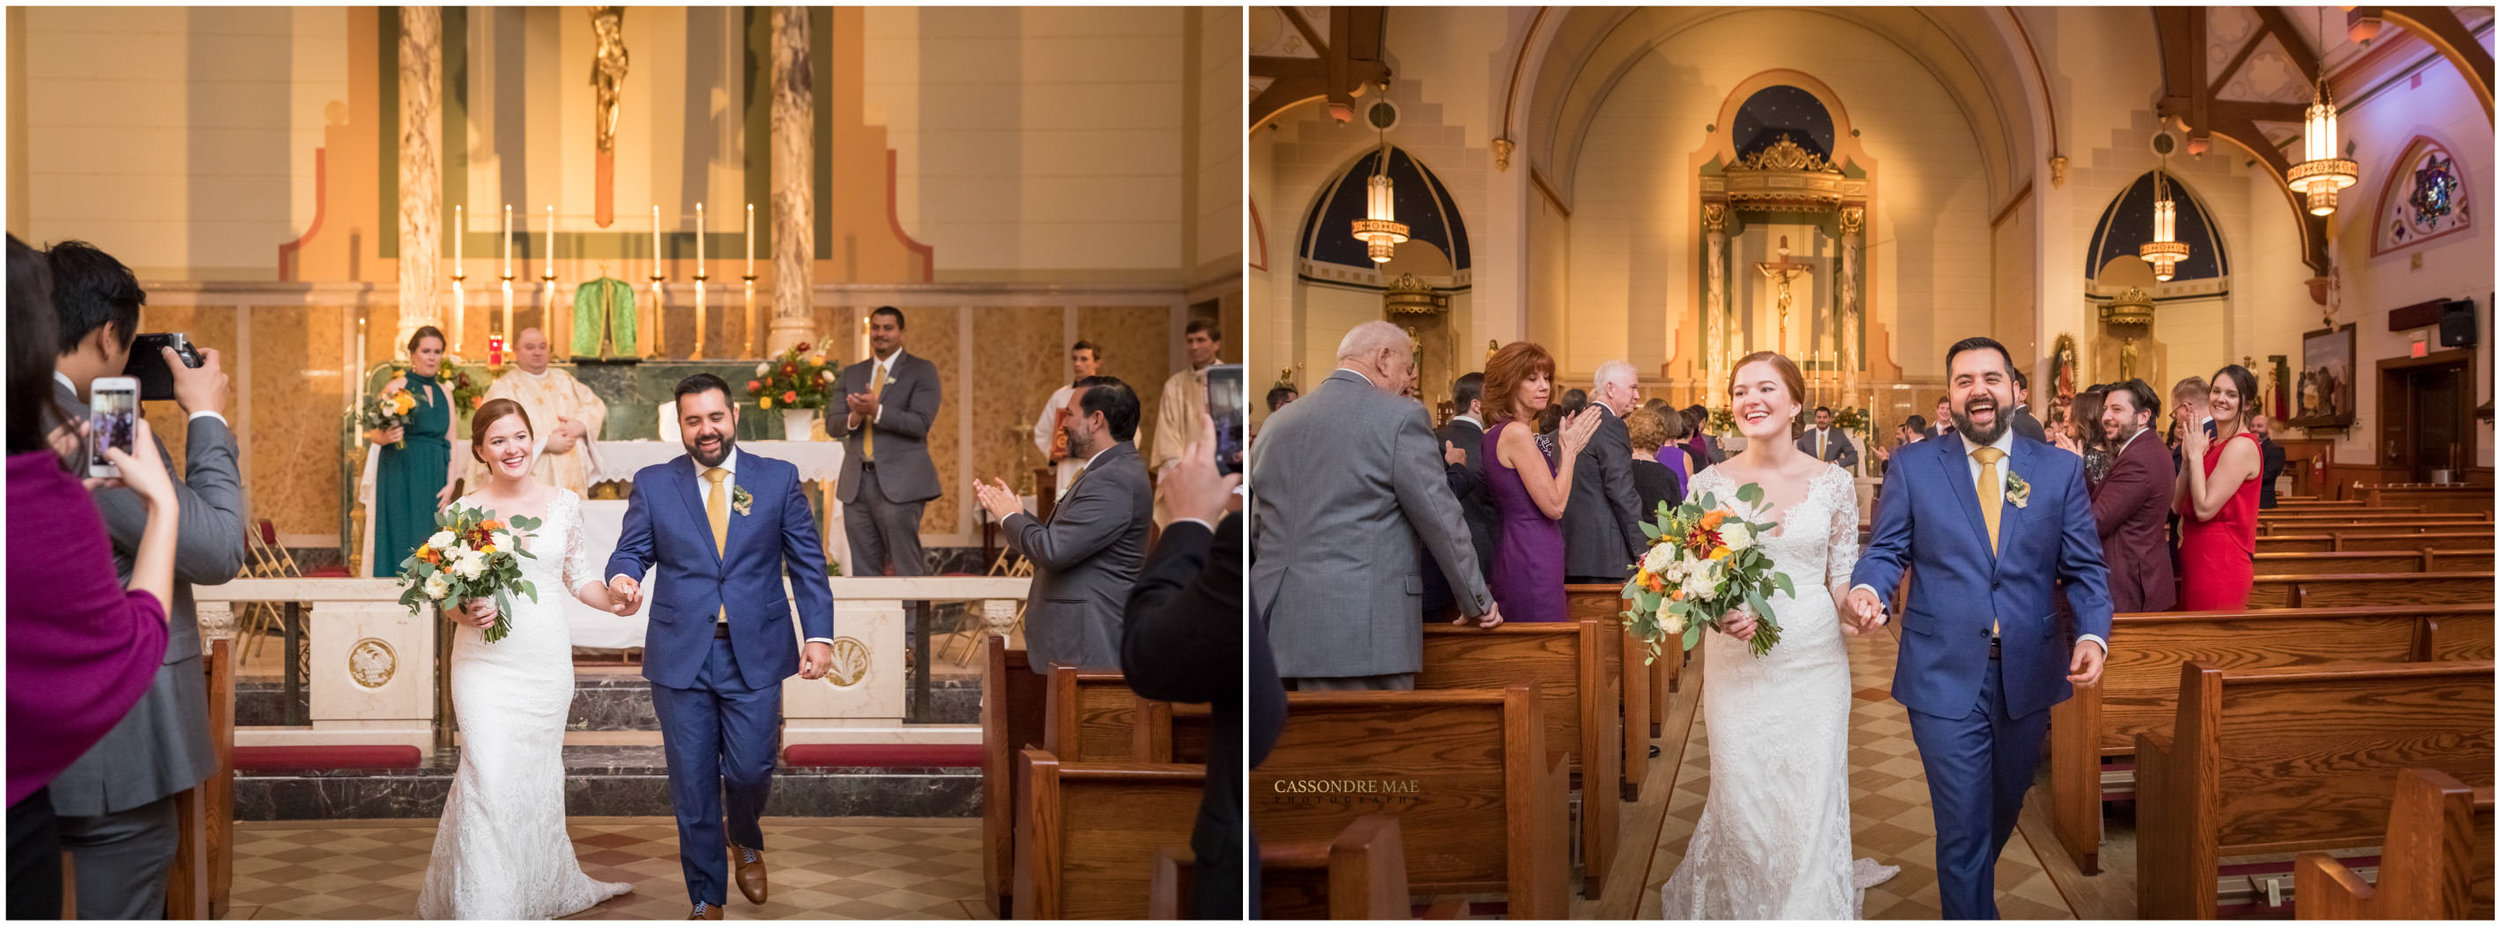 Cassondre Mae Photography Stony Ford Wedding 29.jpg